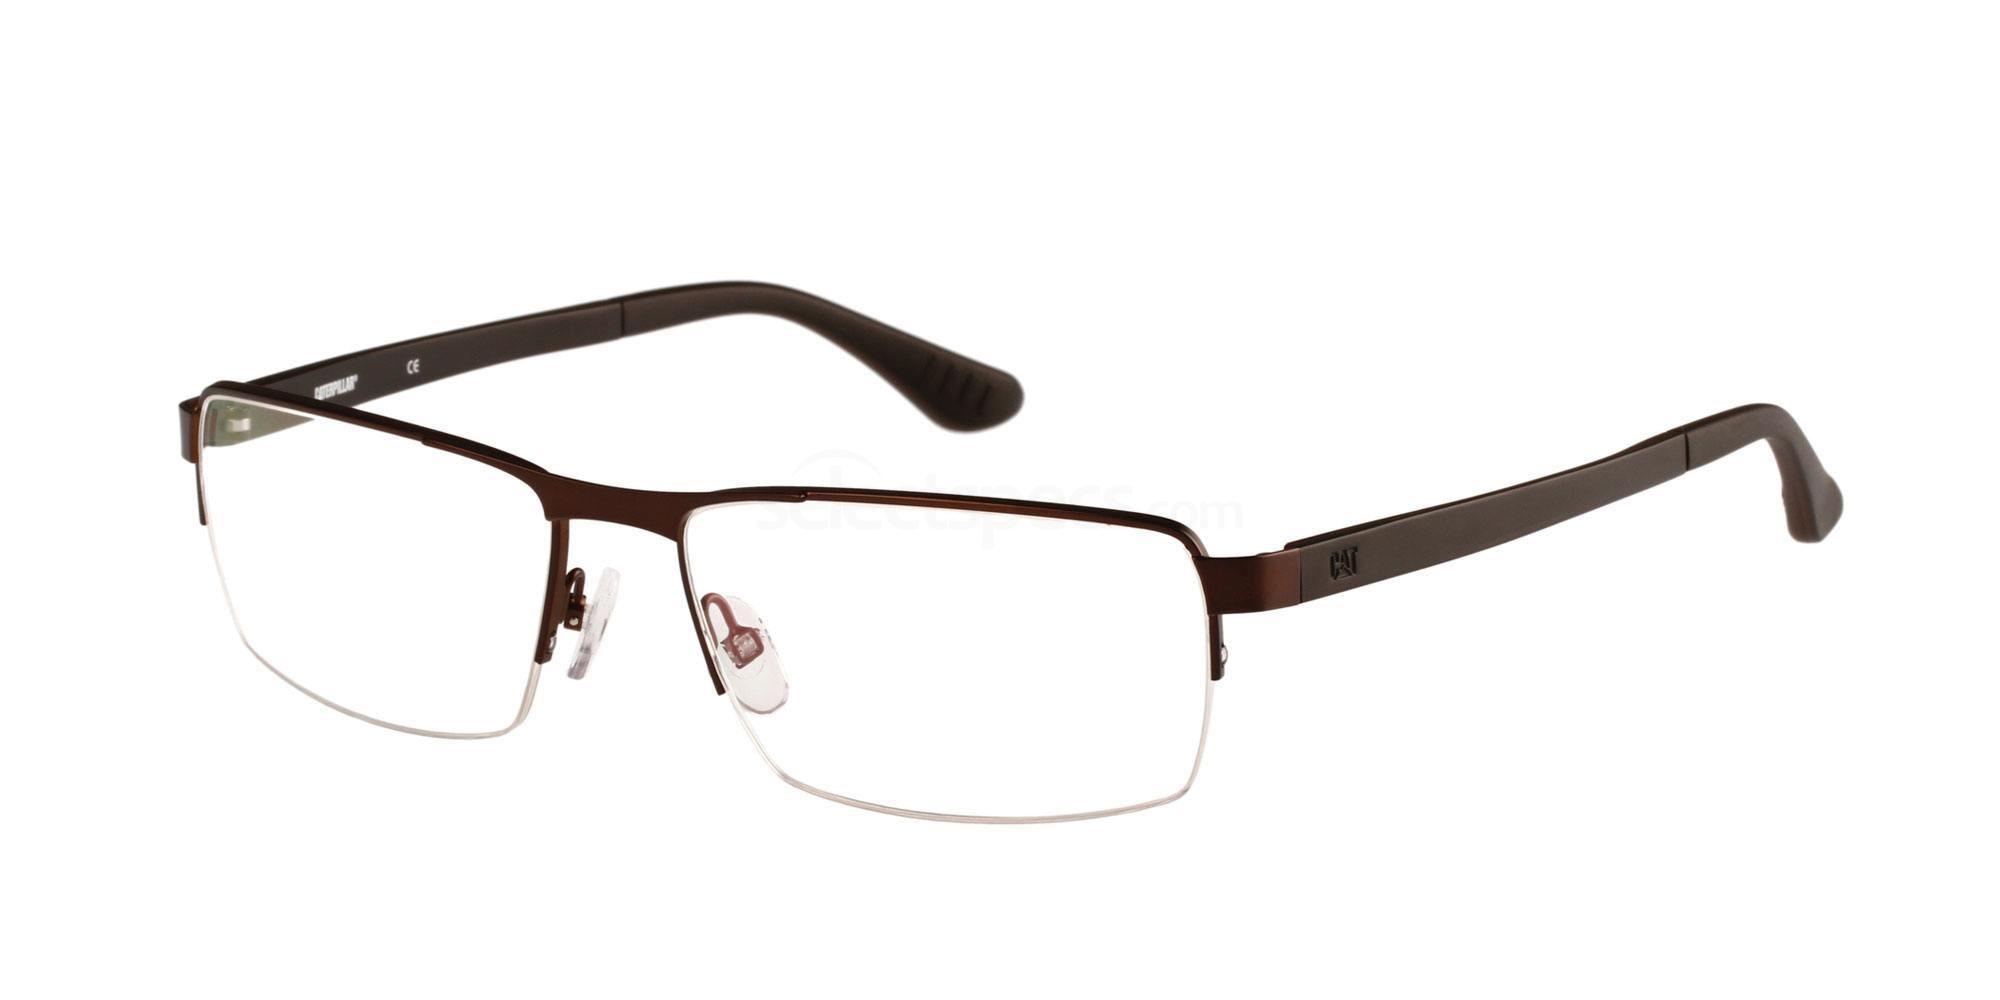 003 CTO J08 Glasses, CAT